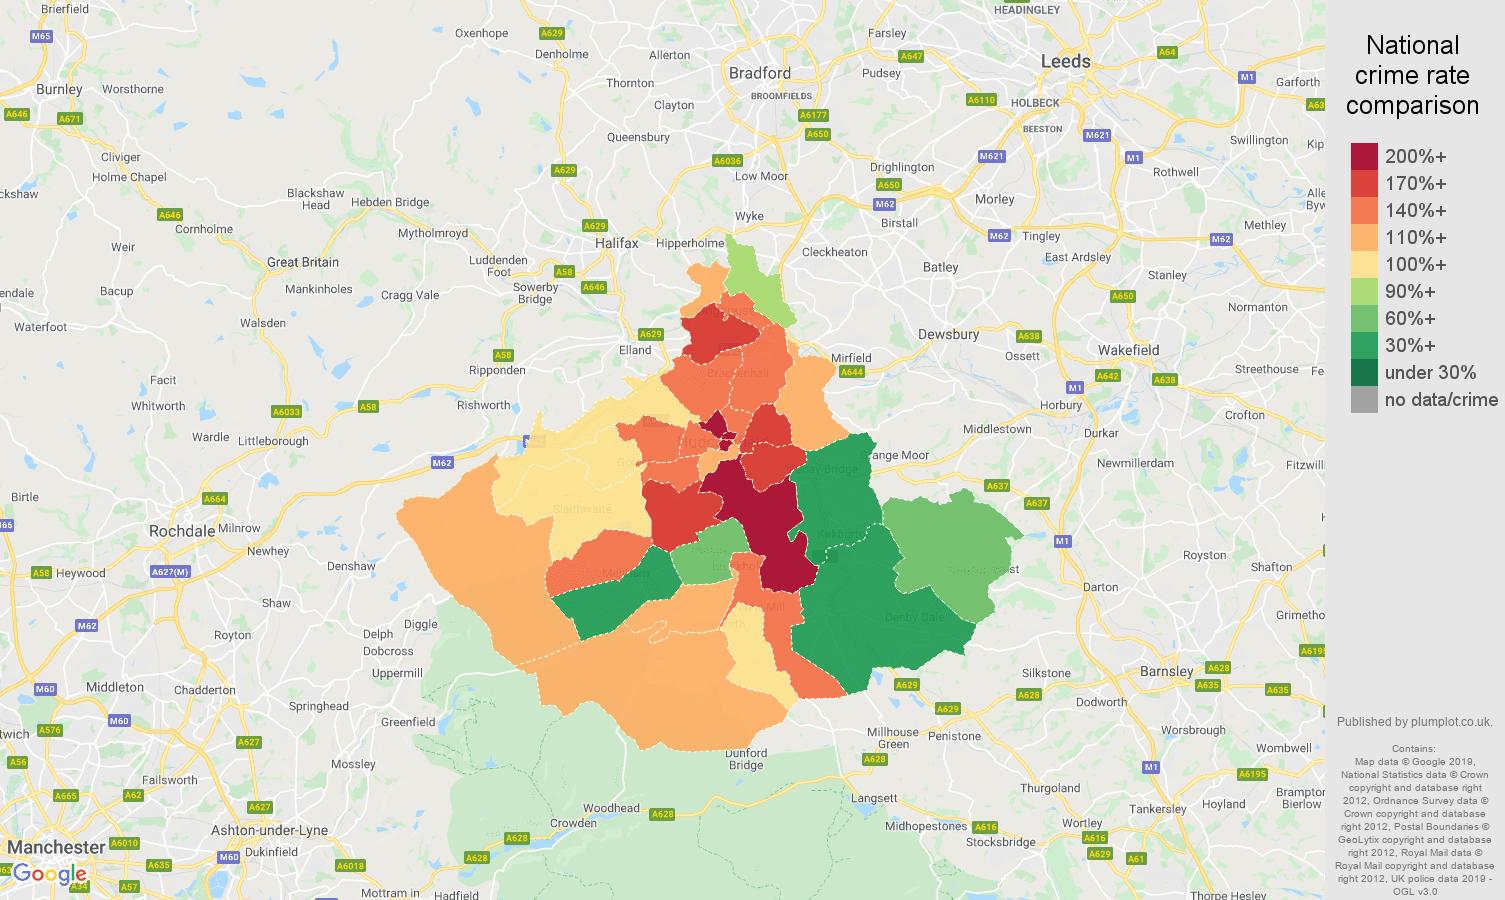 Huddersfield public order crime rate comparison map